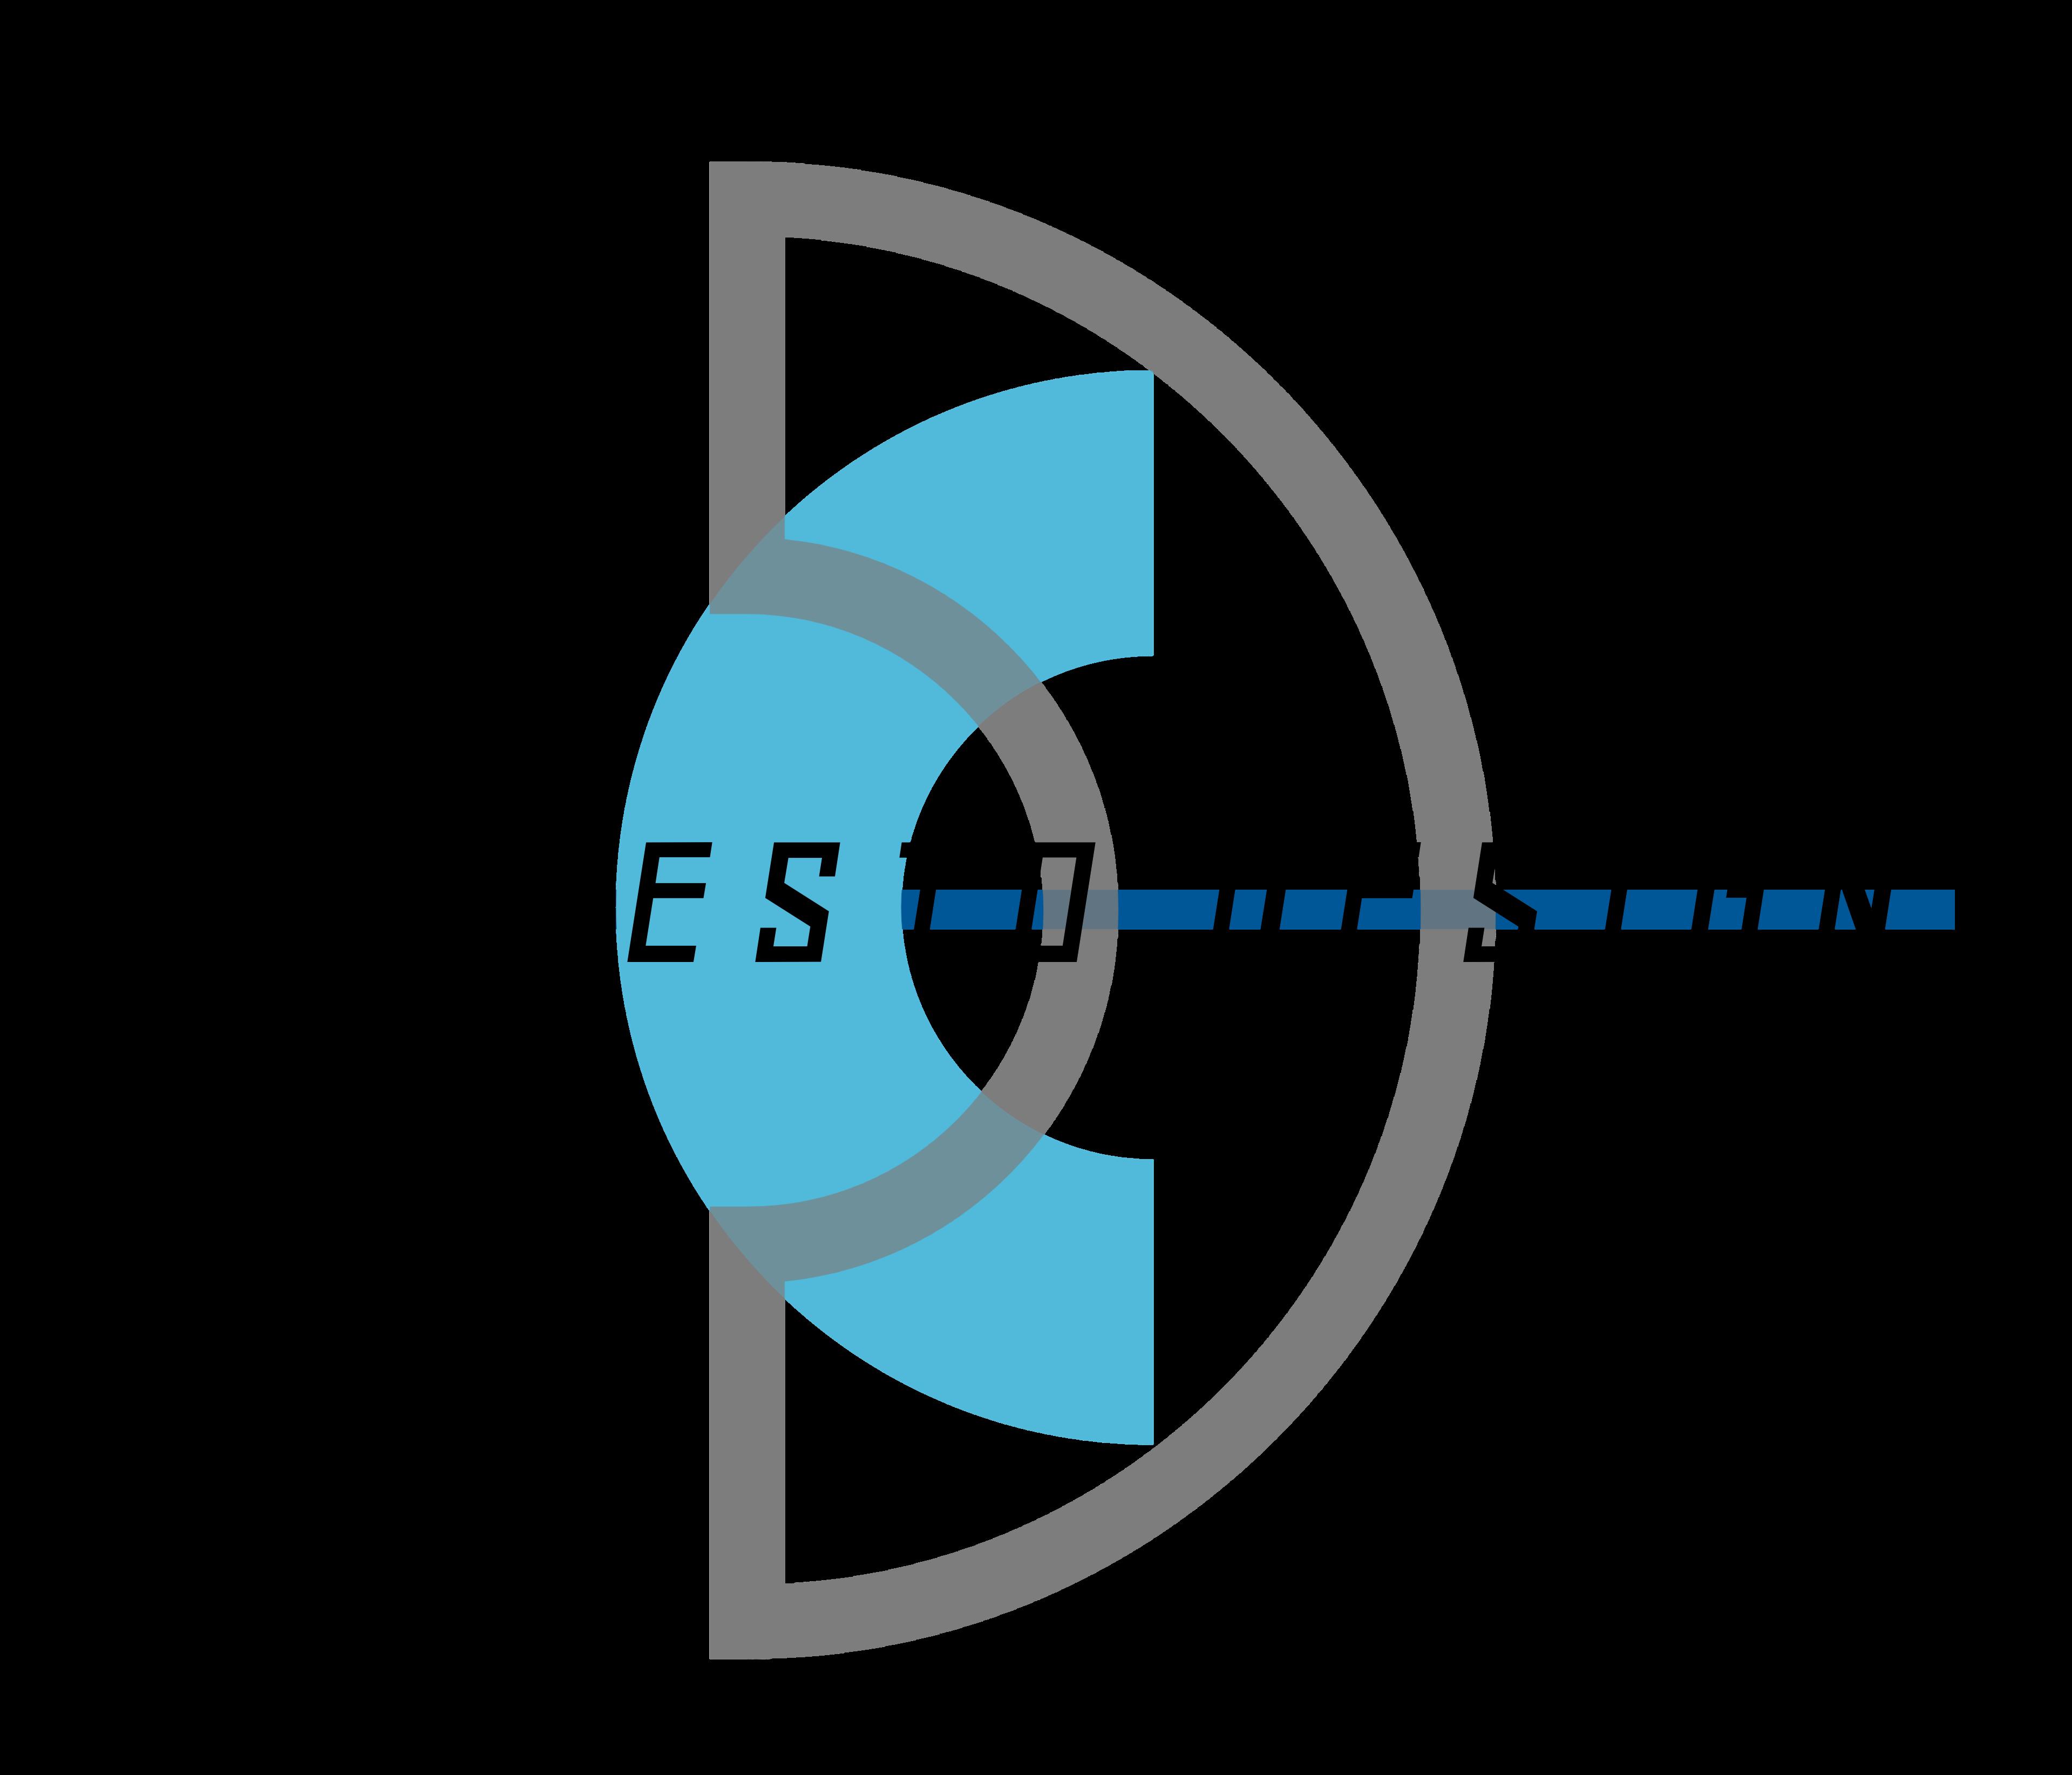 Ernesto Design